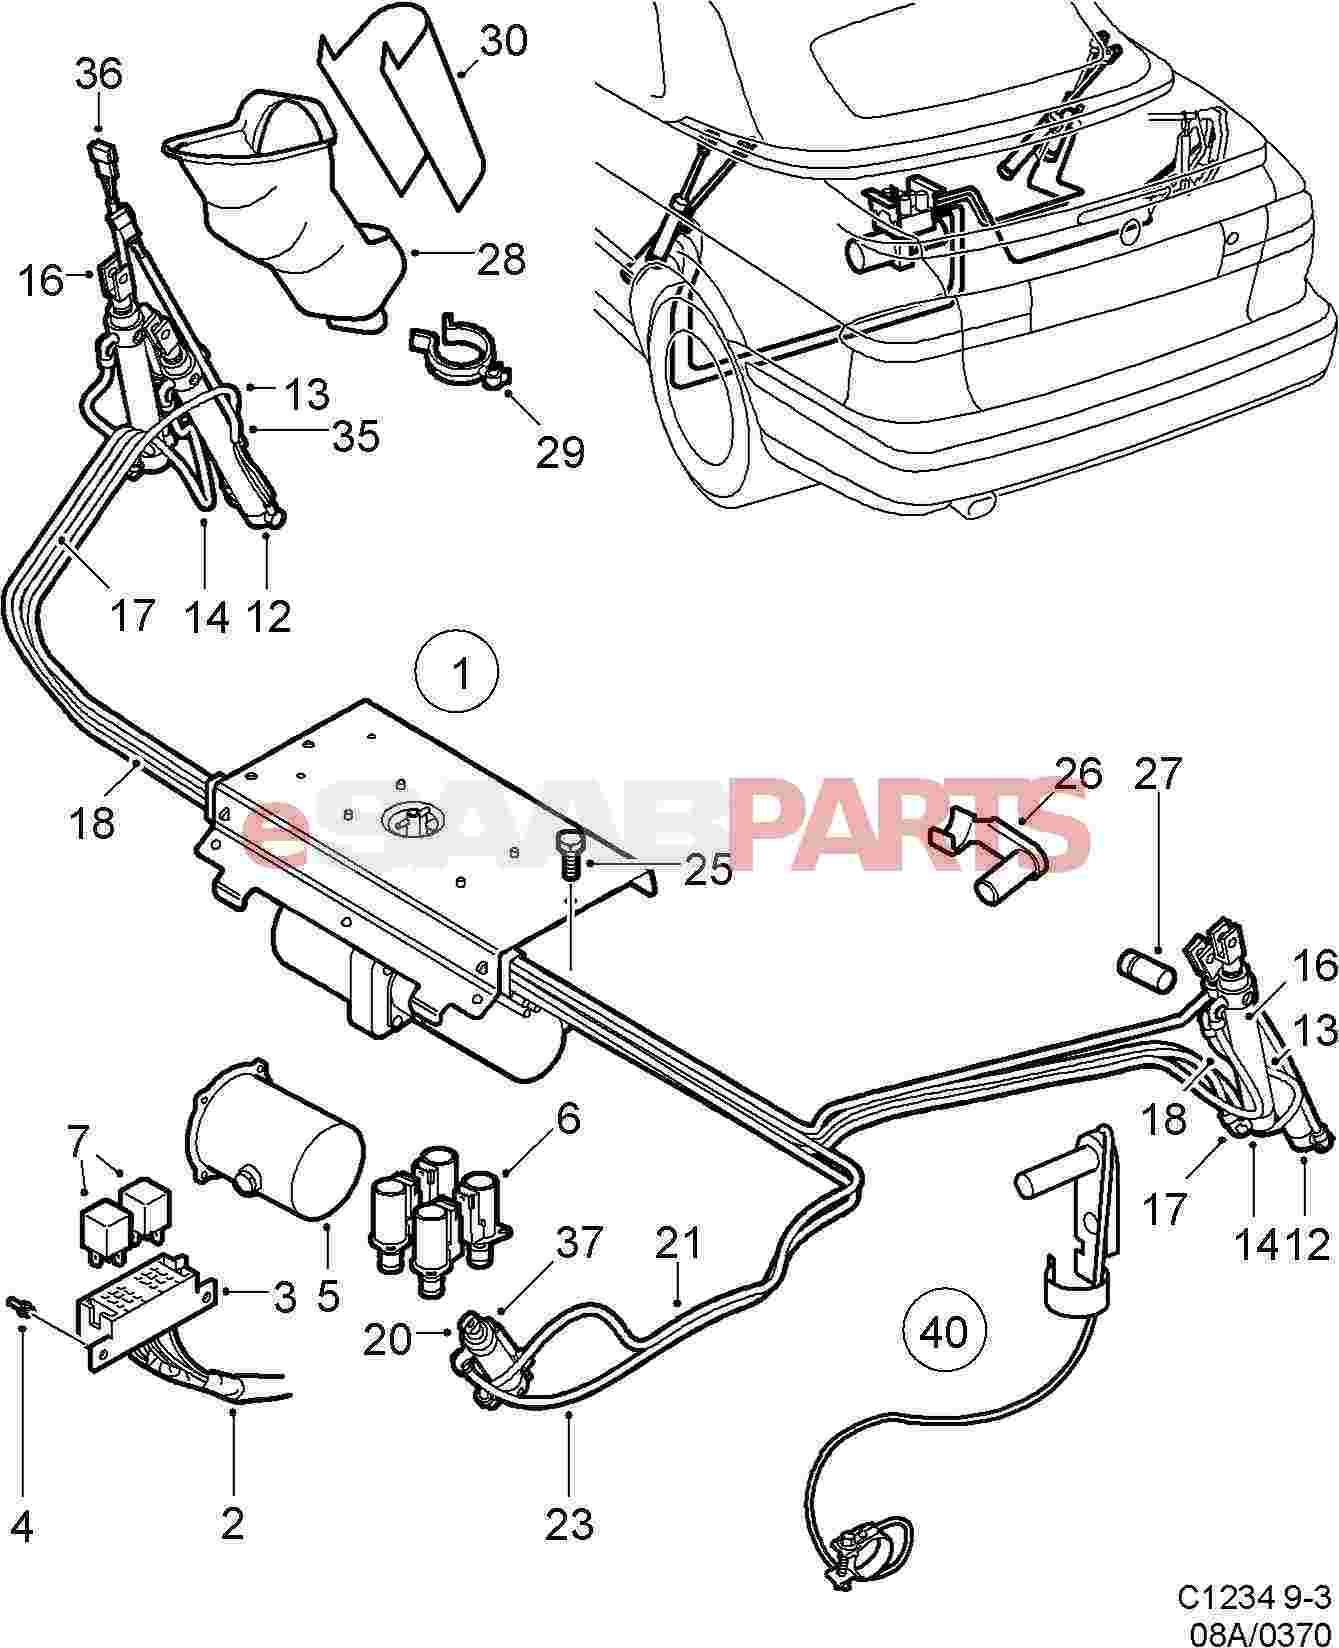 92150012 saab screw genuine saab parts from esaabparts rh esaabparts